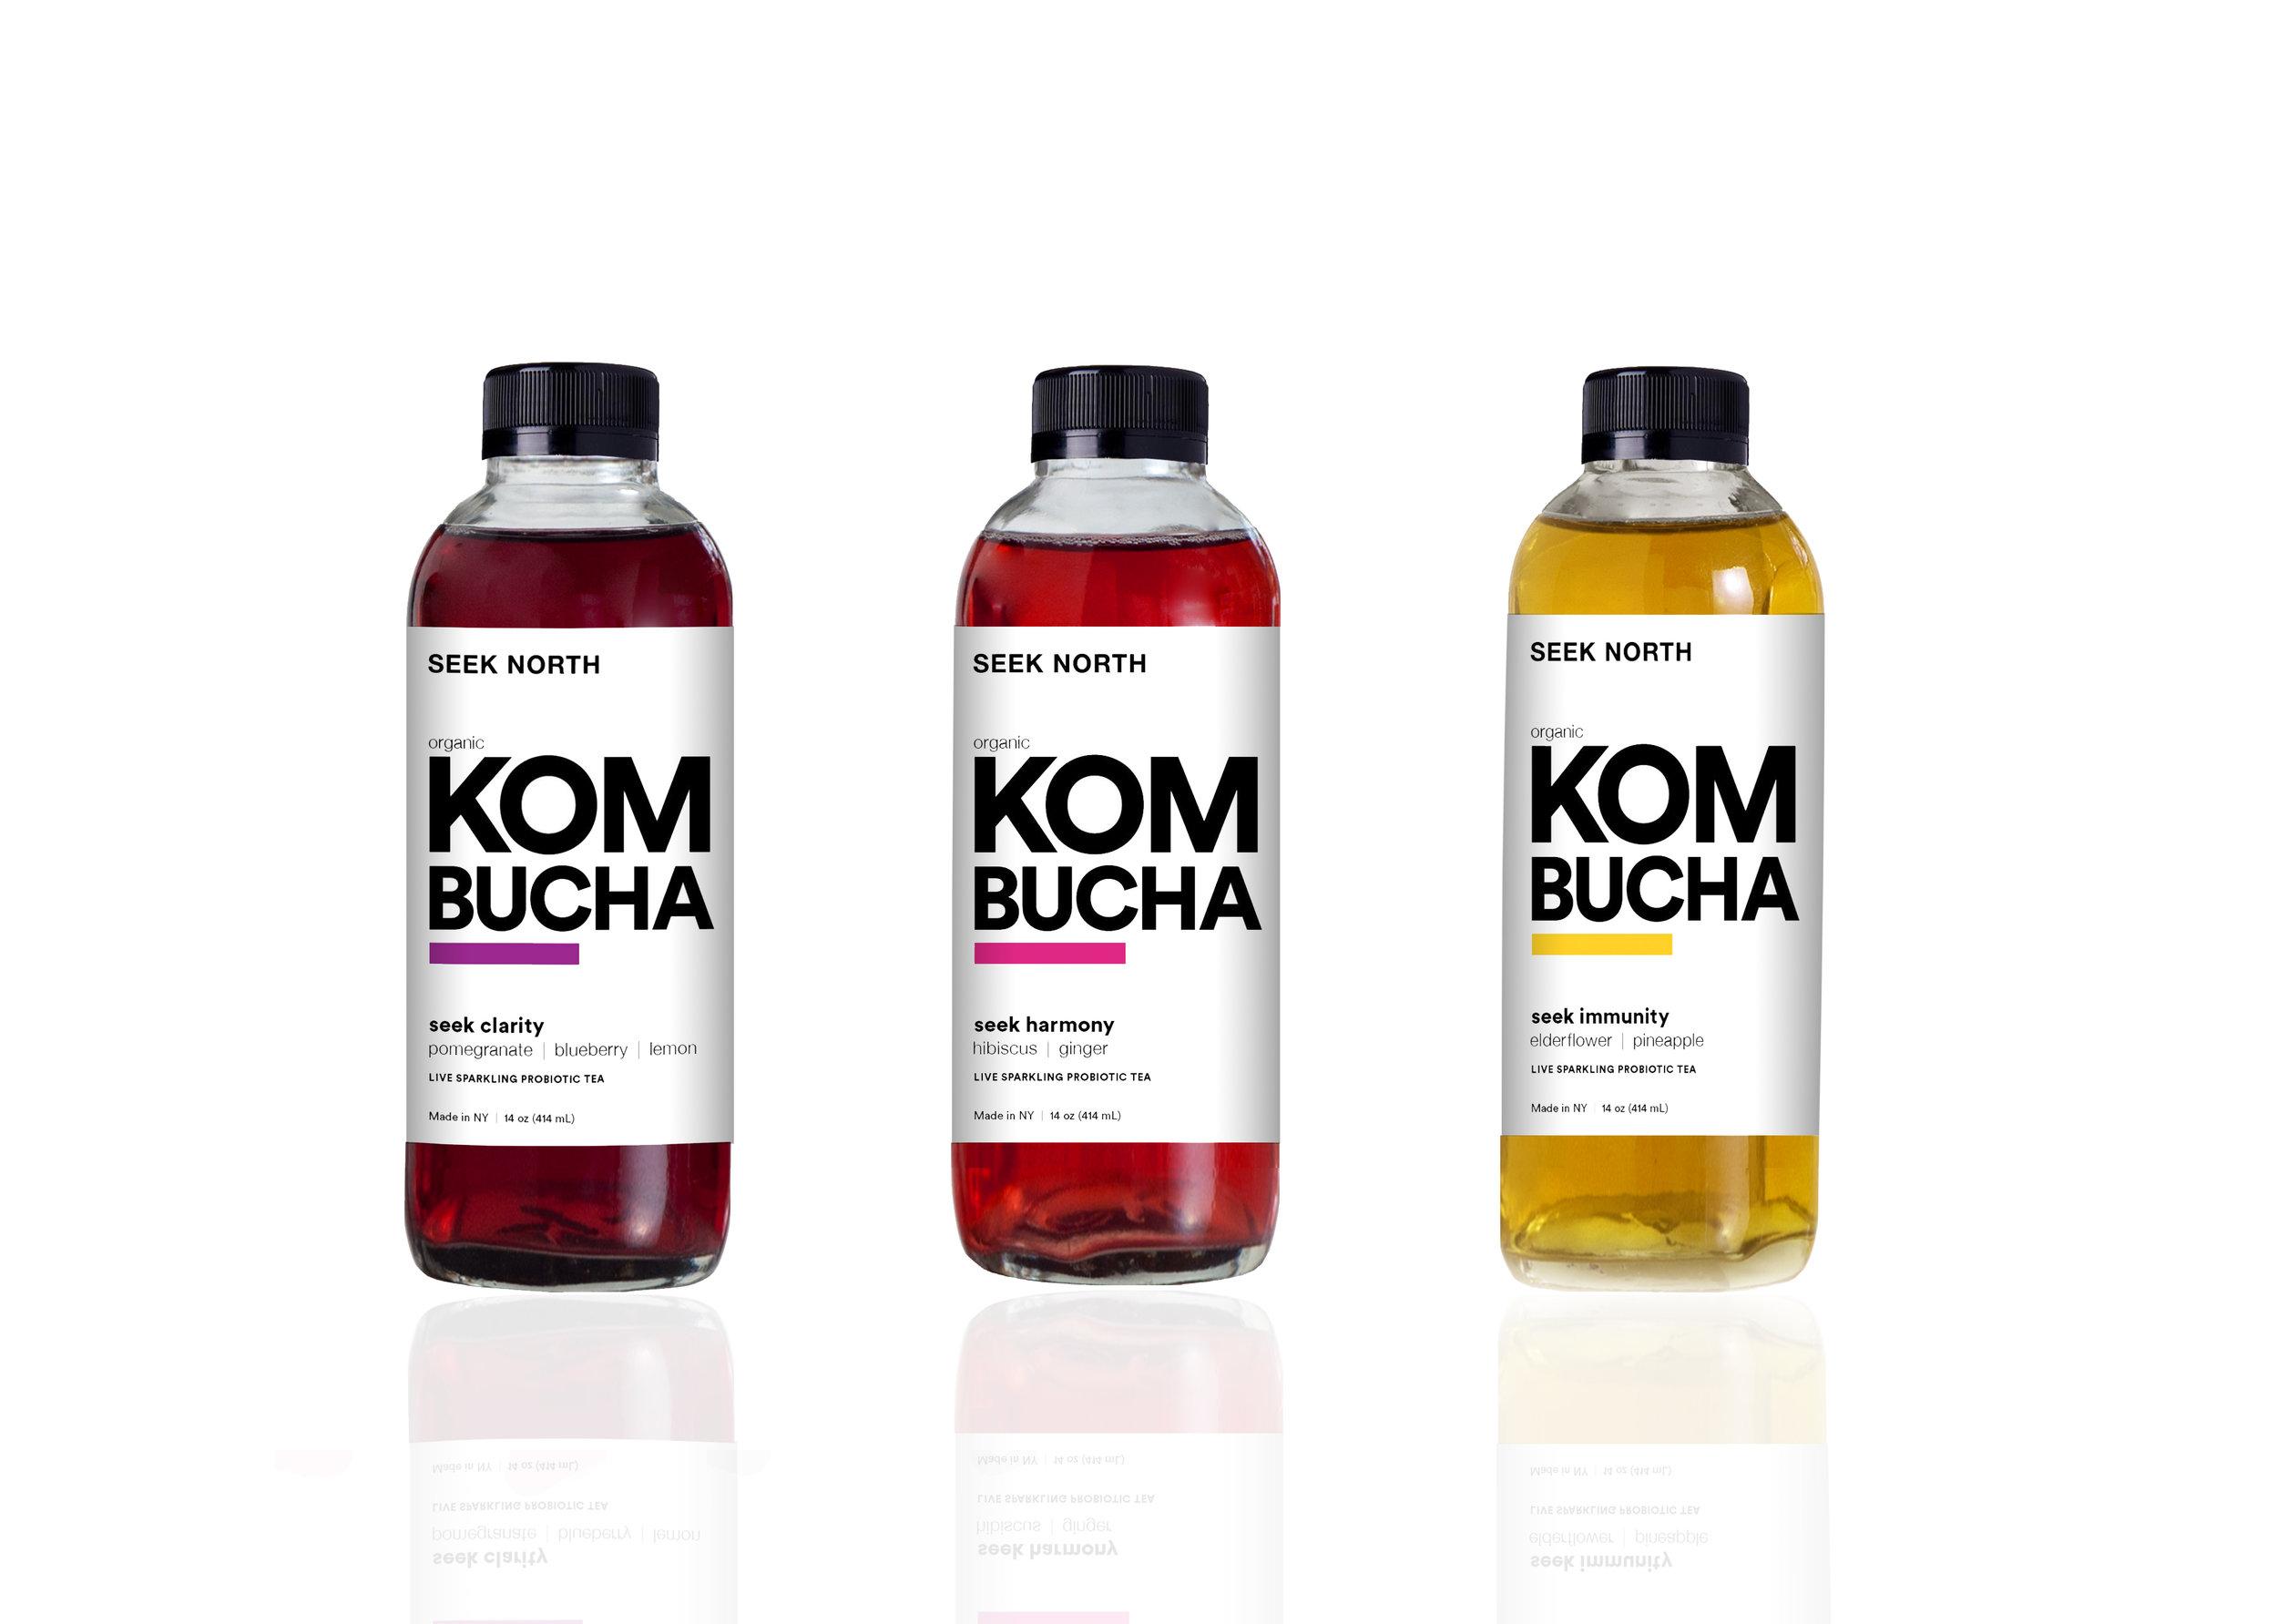 seek north kombucha bottles.jpg